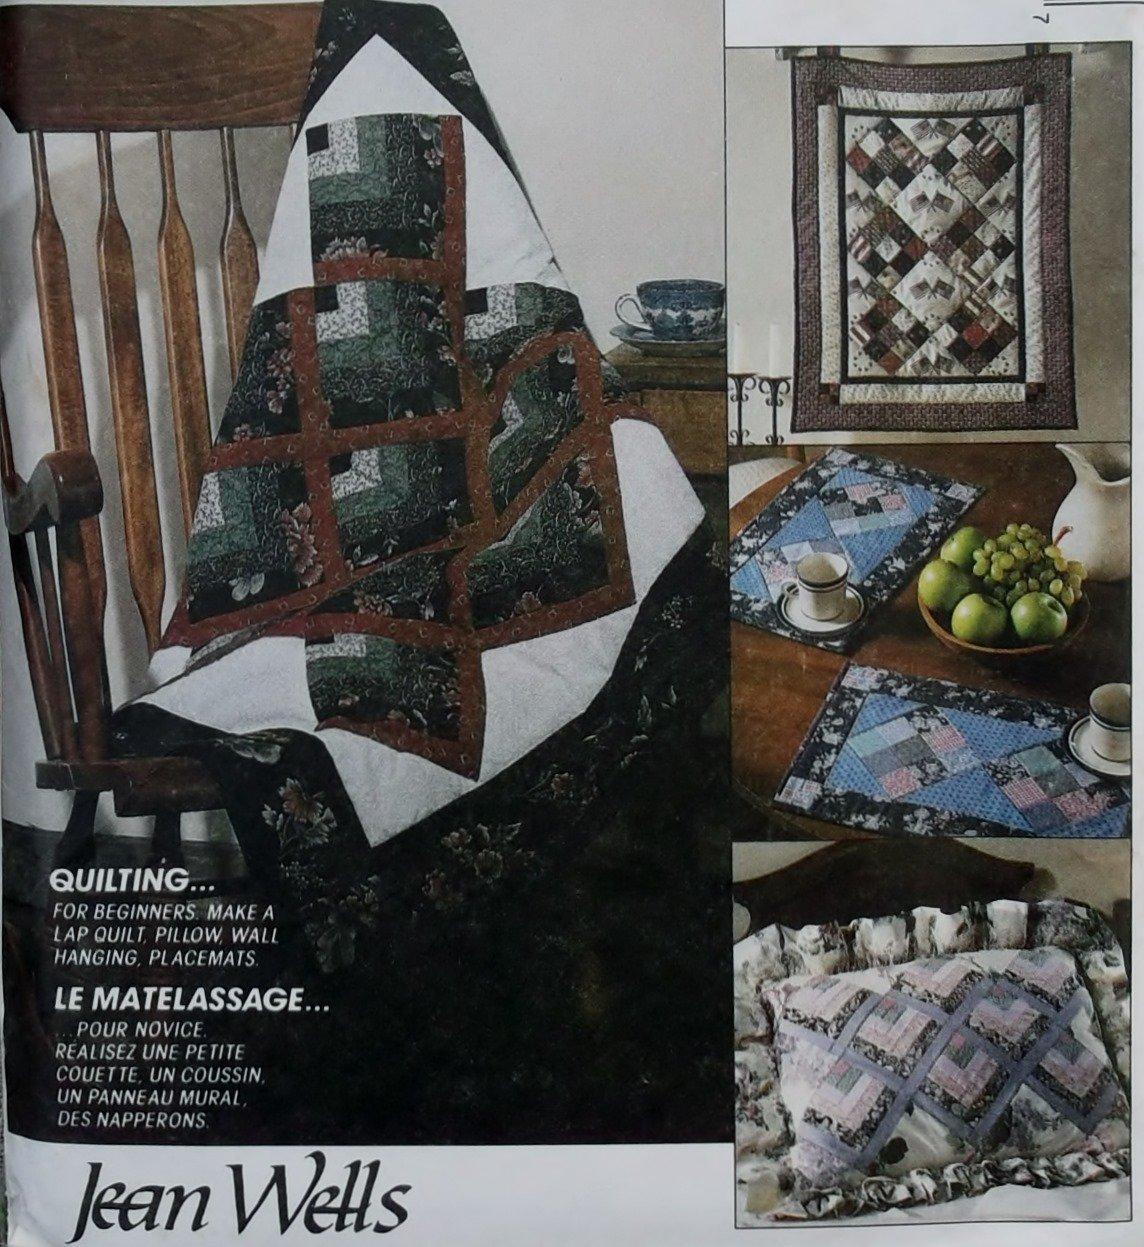 McCalls 5463 Pattern Beginner lap quilt, pillow, wall hanging, & placemats, UNCUT